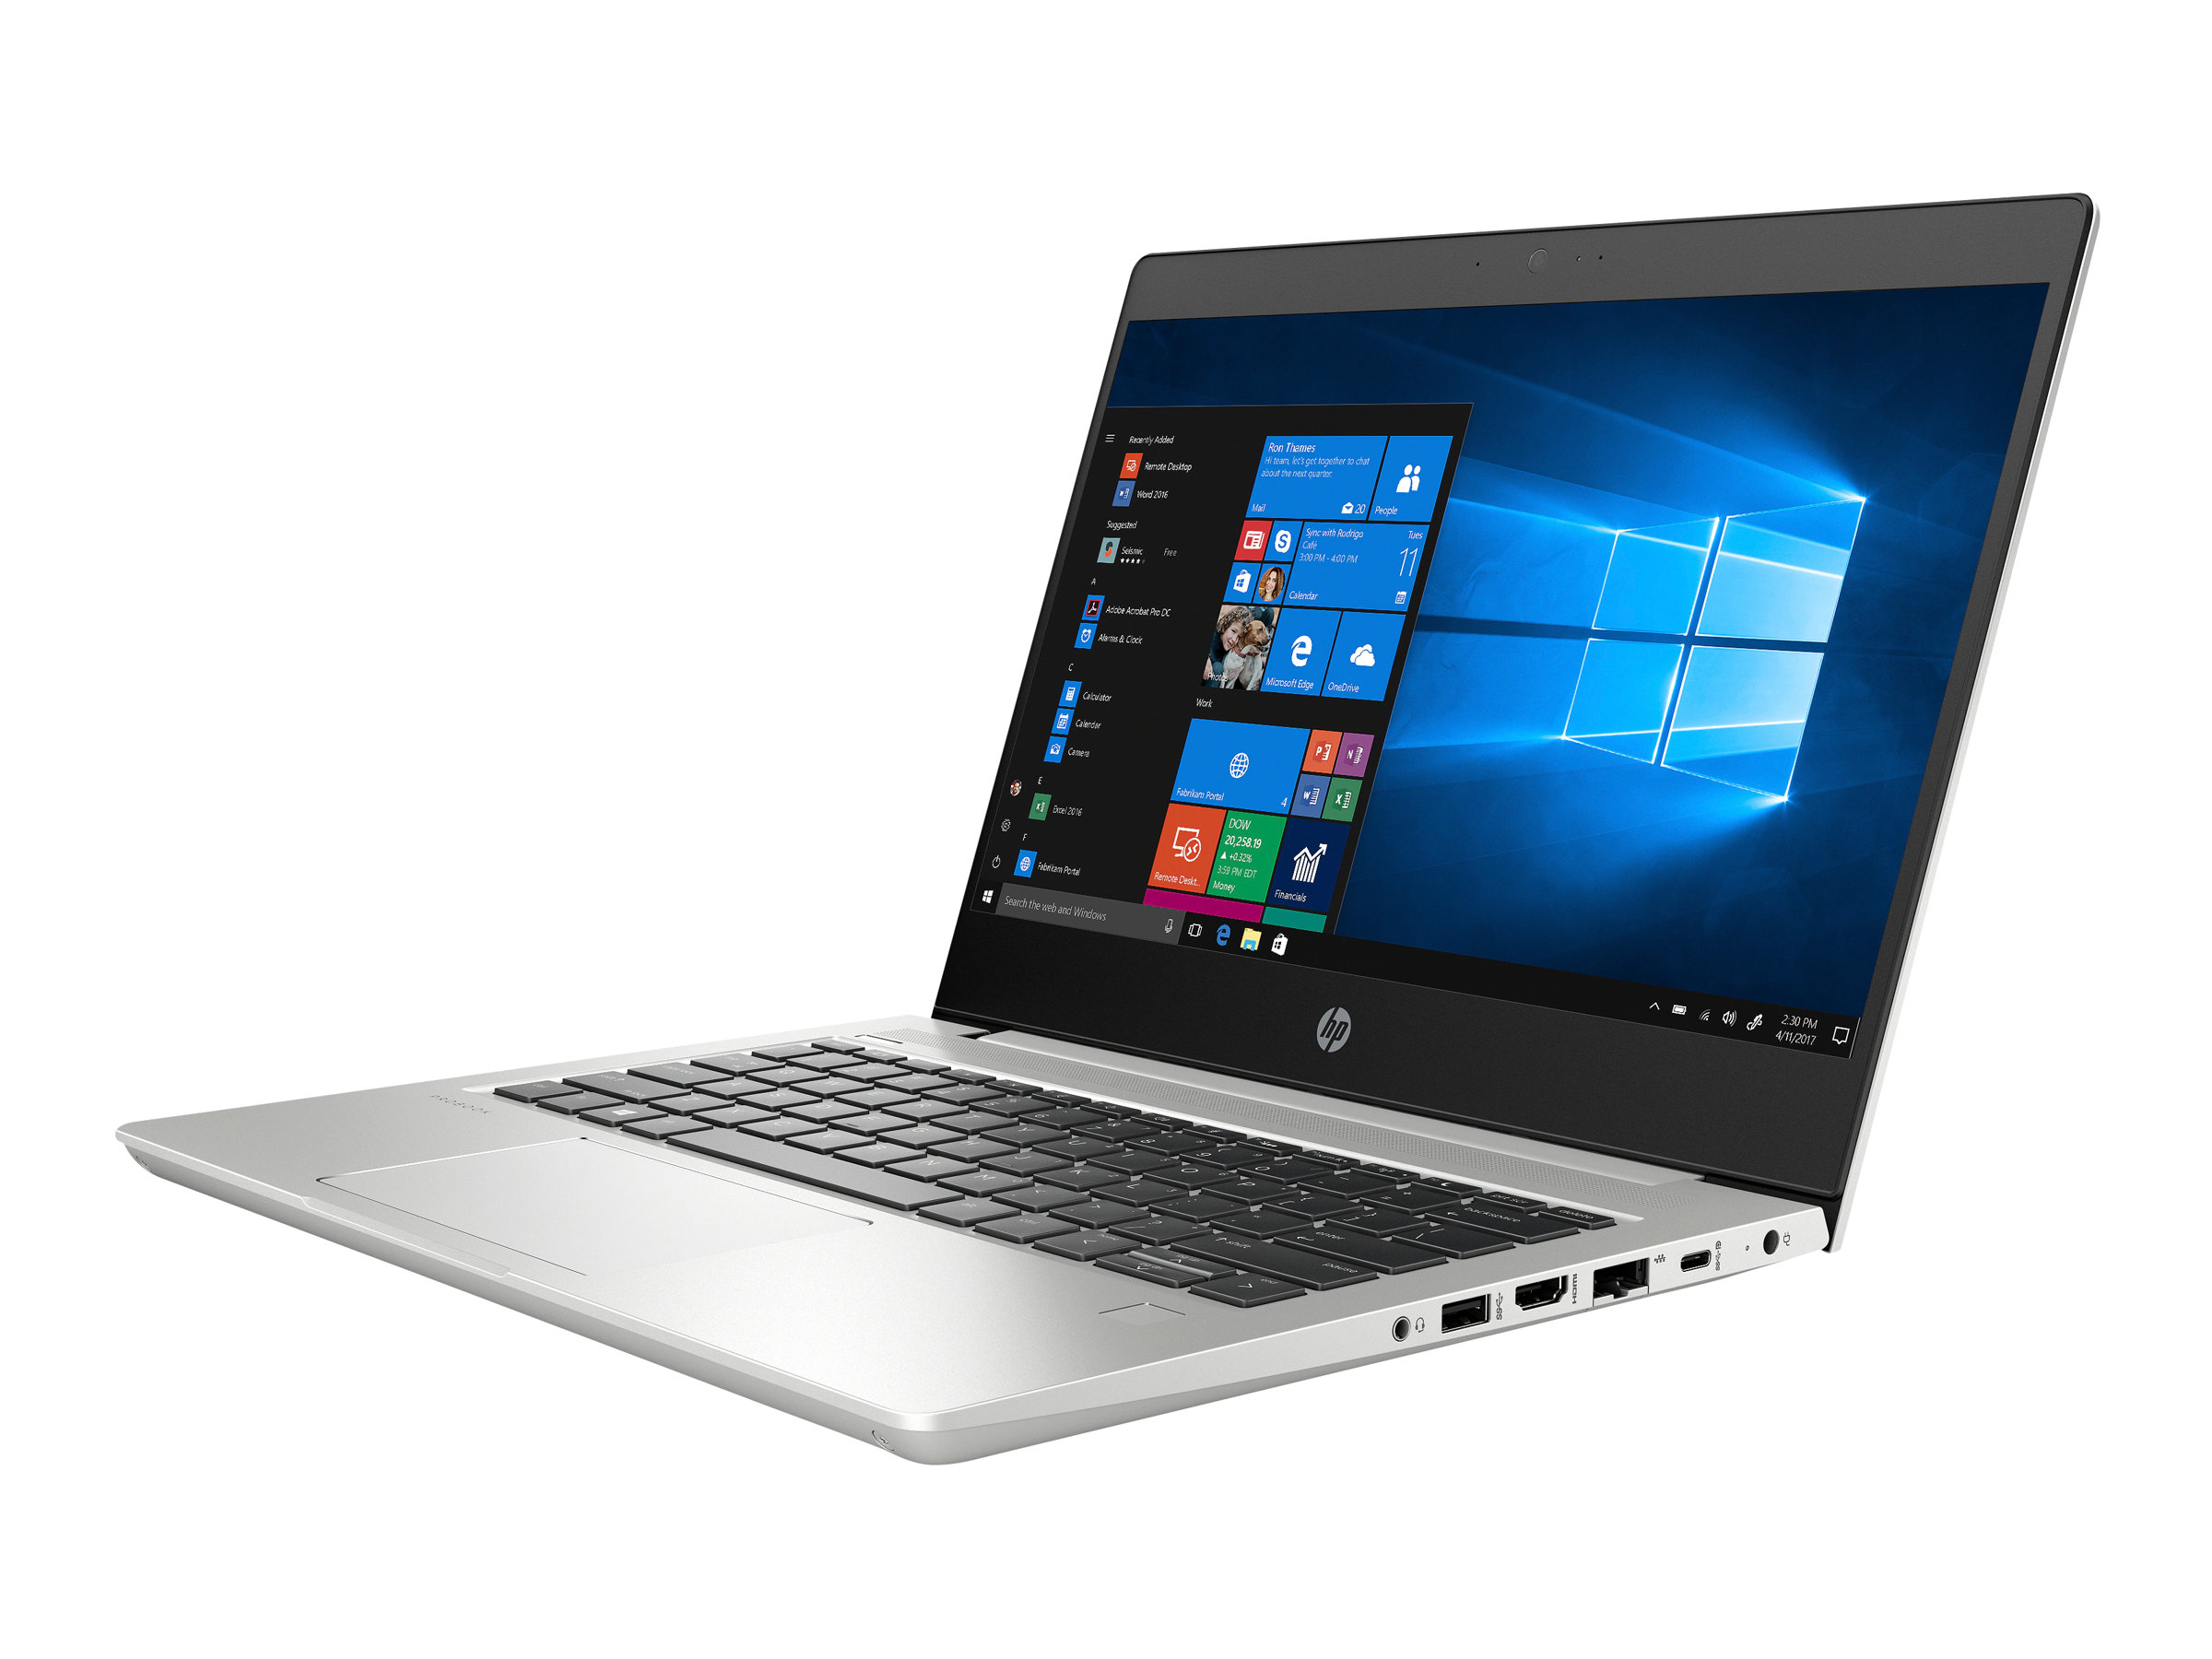 "HP ProBook 430 G6 - Core i5 8265U / 1.6 GHz - Win 10 Pro 64-Bit - 8 GB RAM - 256 GB SSD NVMe, HP Value - 33.8 cm (13.3"")"